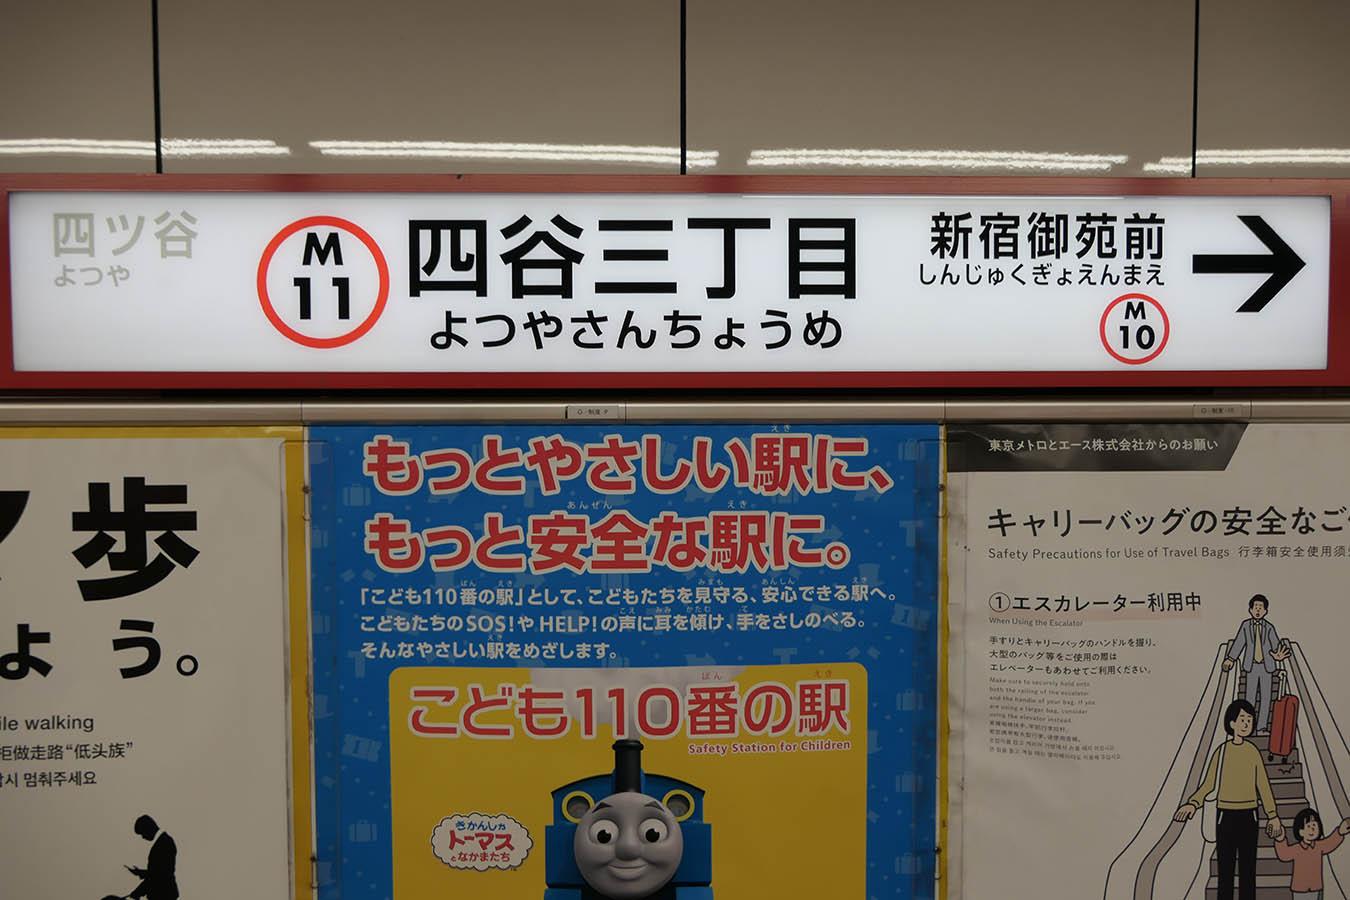 M11_photo05.jpg